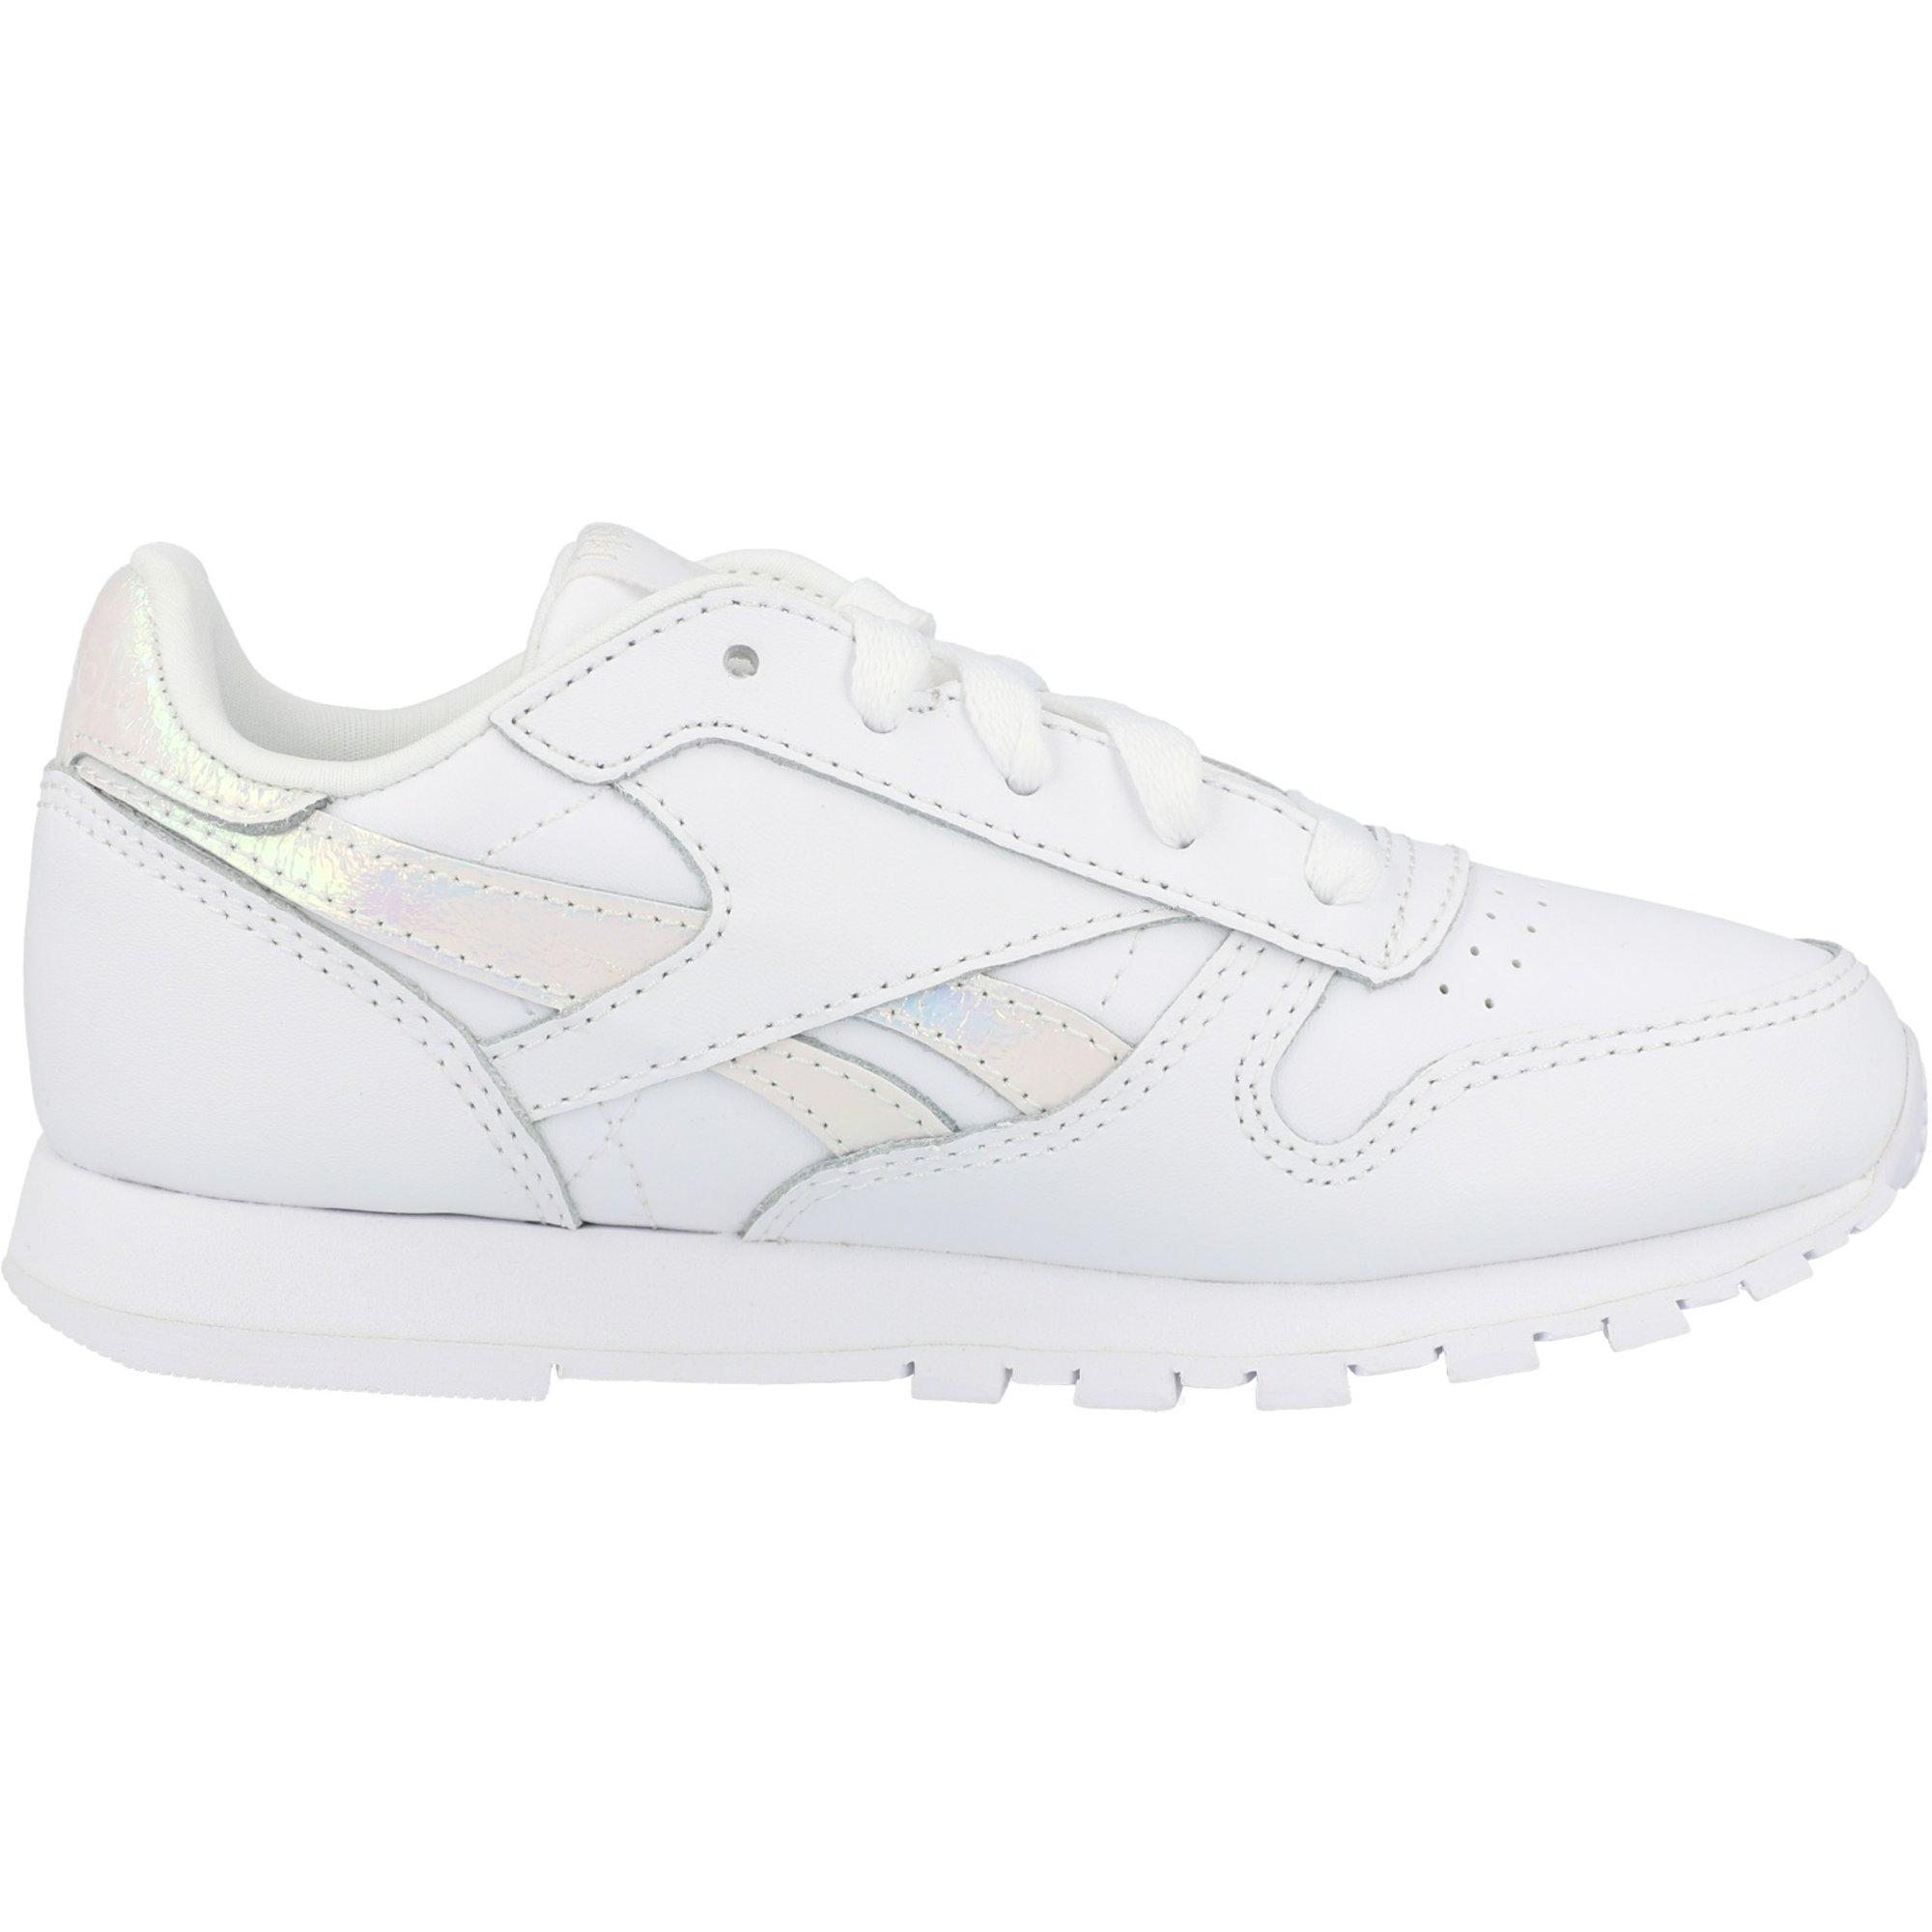 Reebok Classic Leather White/Iridescent